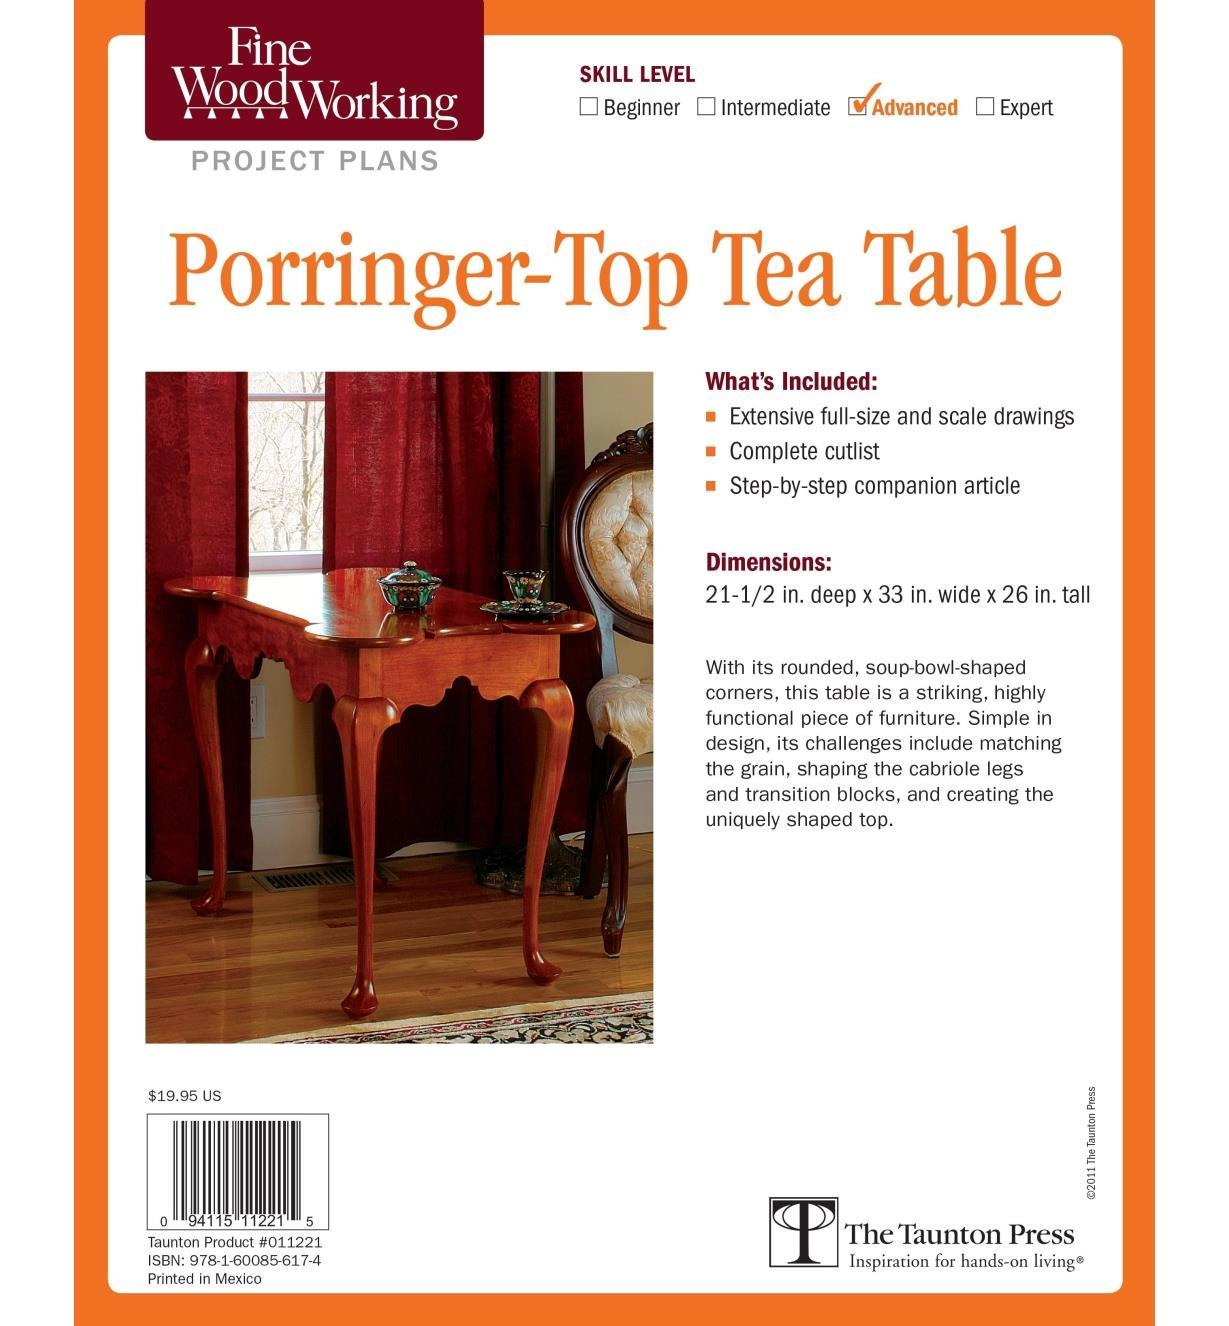 73L2539 - Porringer-Top Tea Table Plan